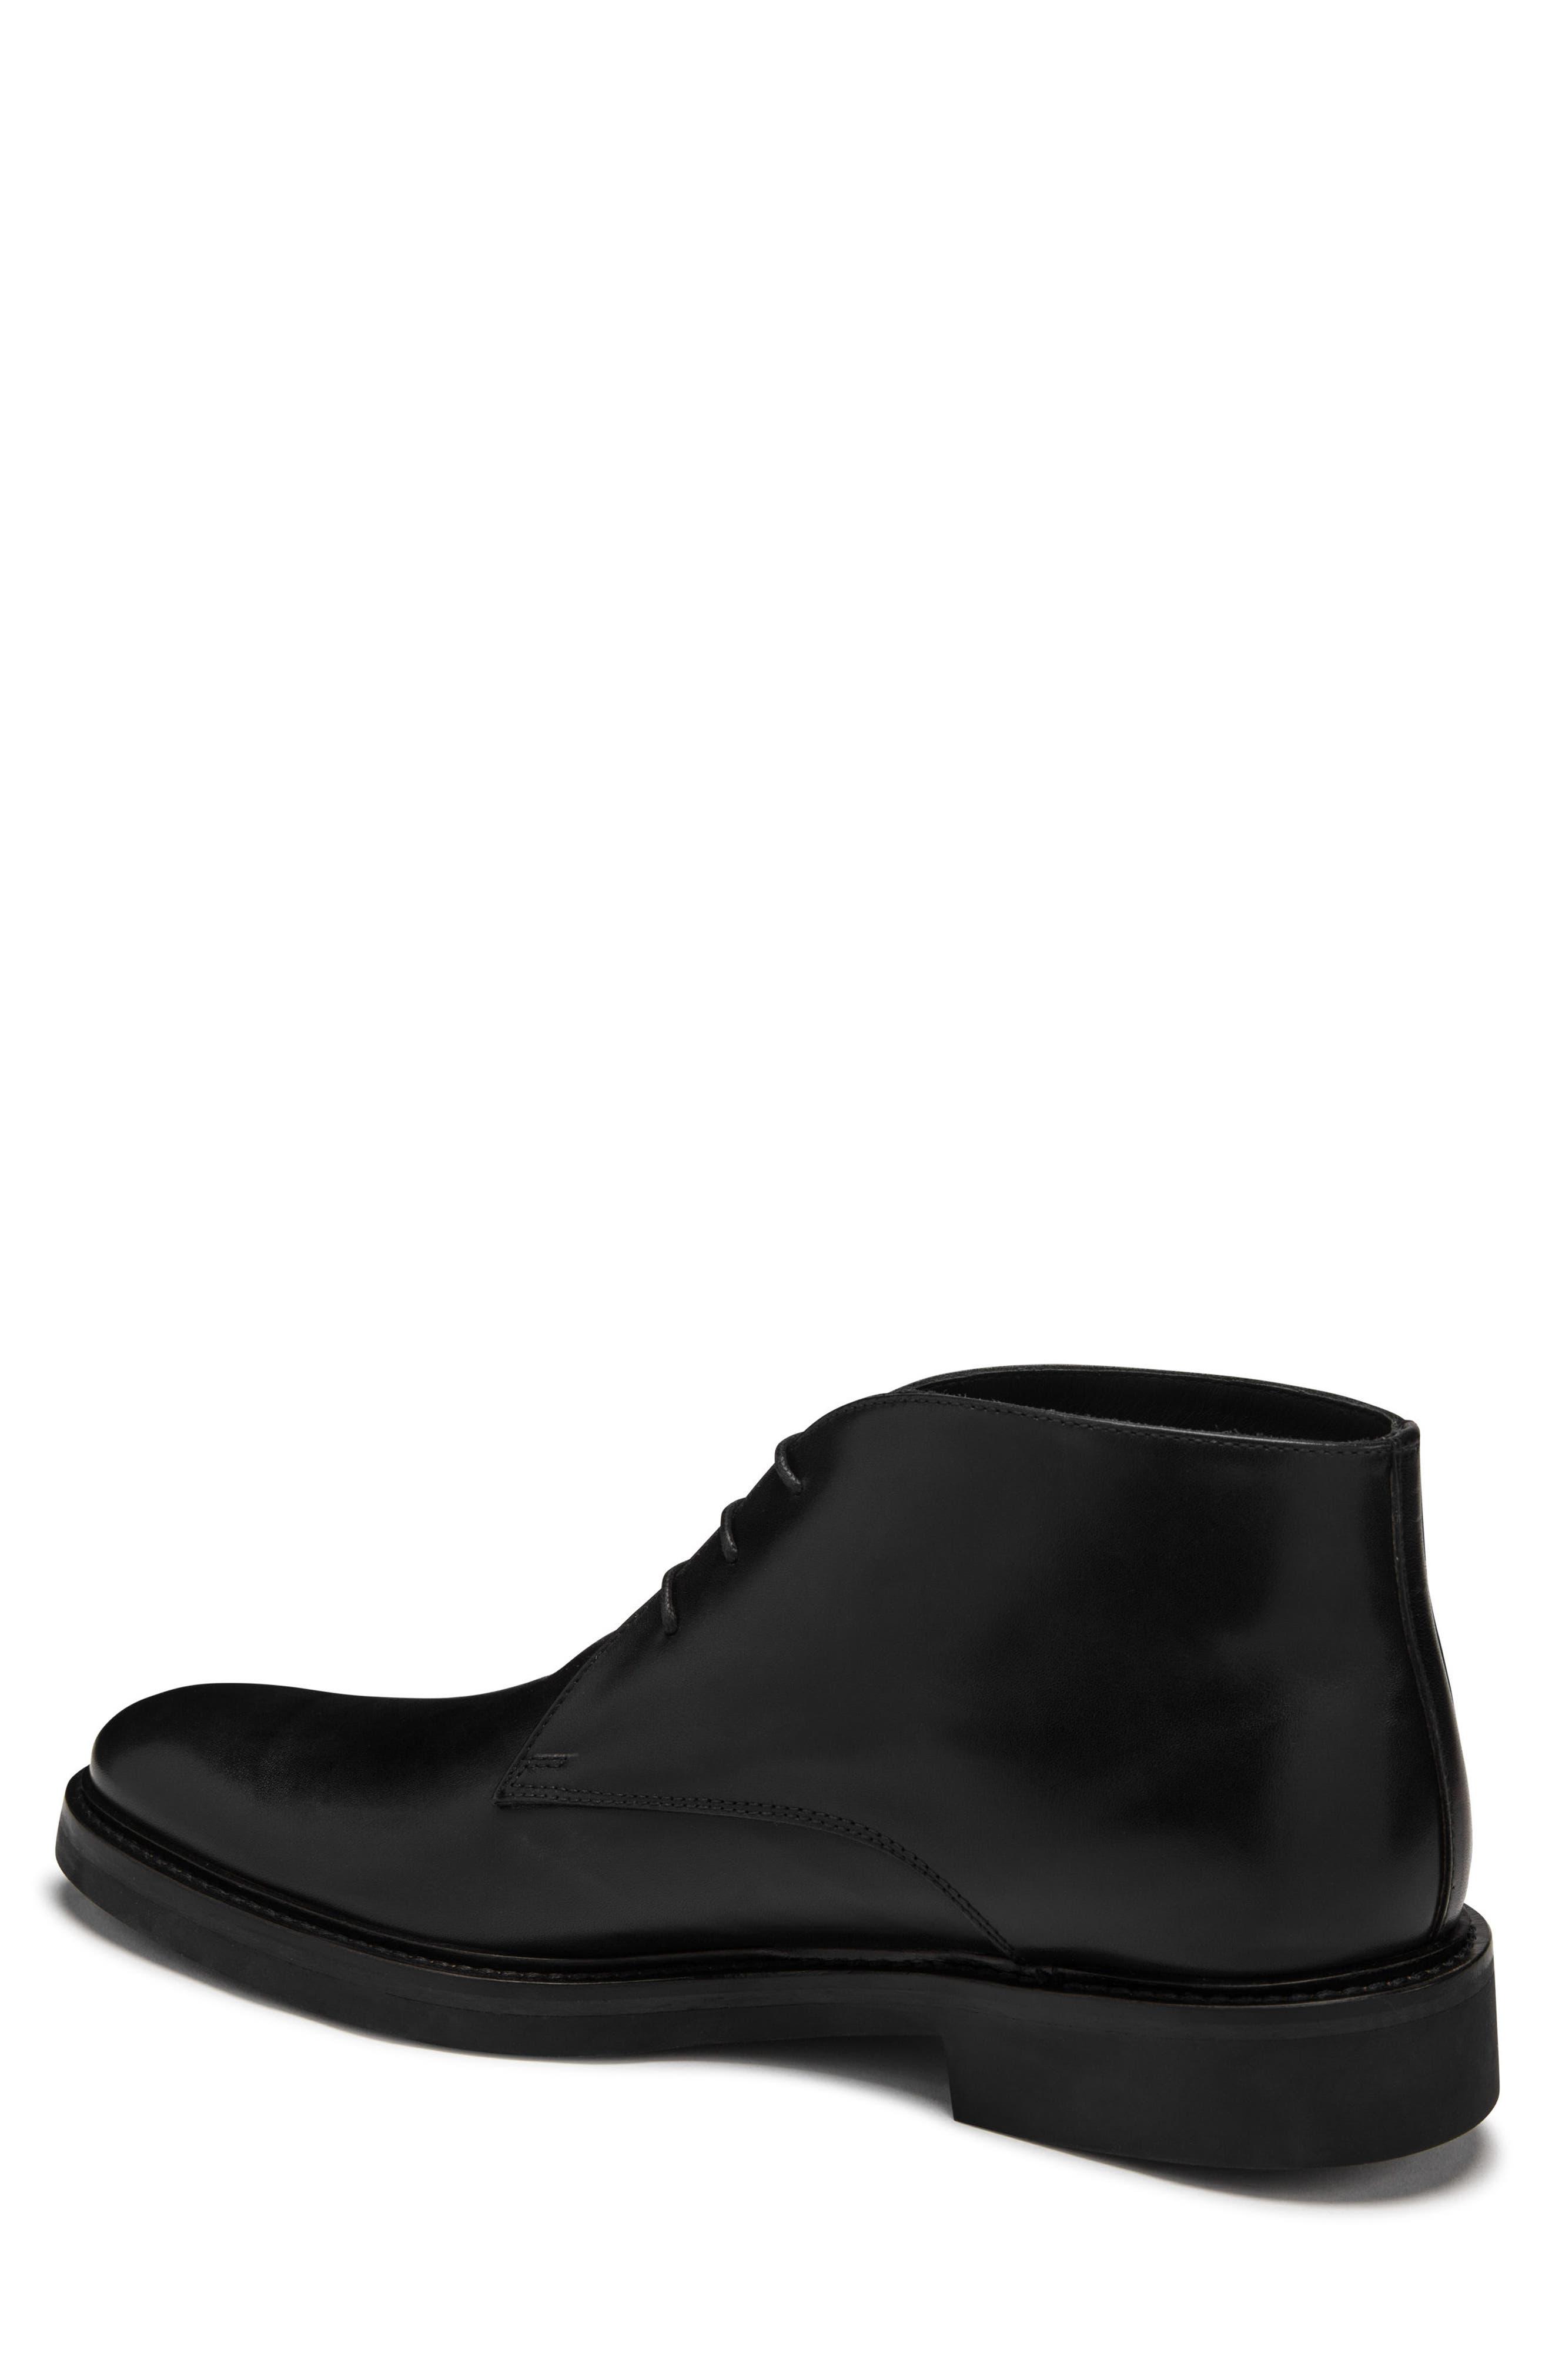 Milano Chukka Boot,                             Alternate thumbnail 2, color,                             NERO